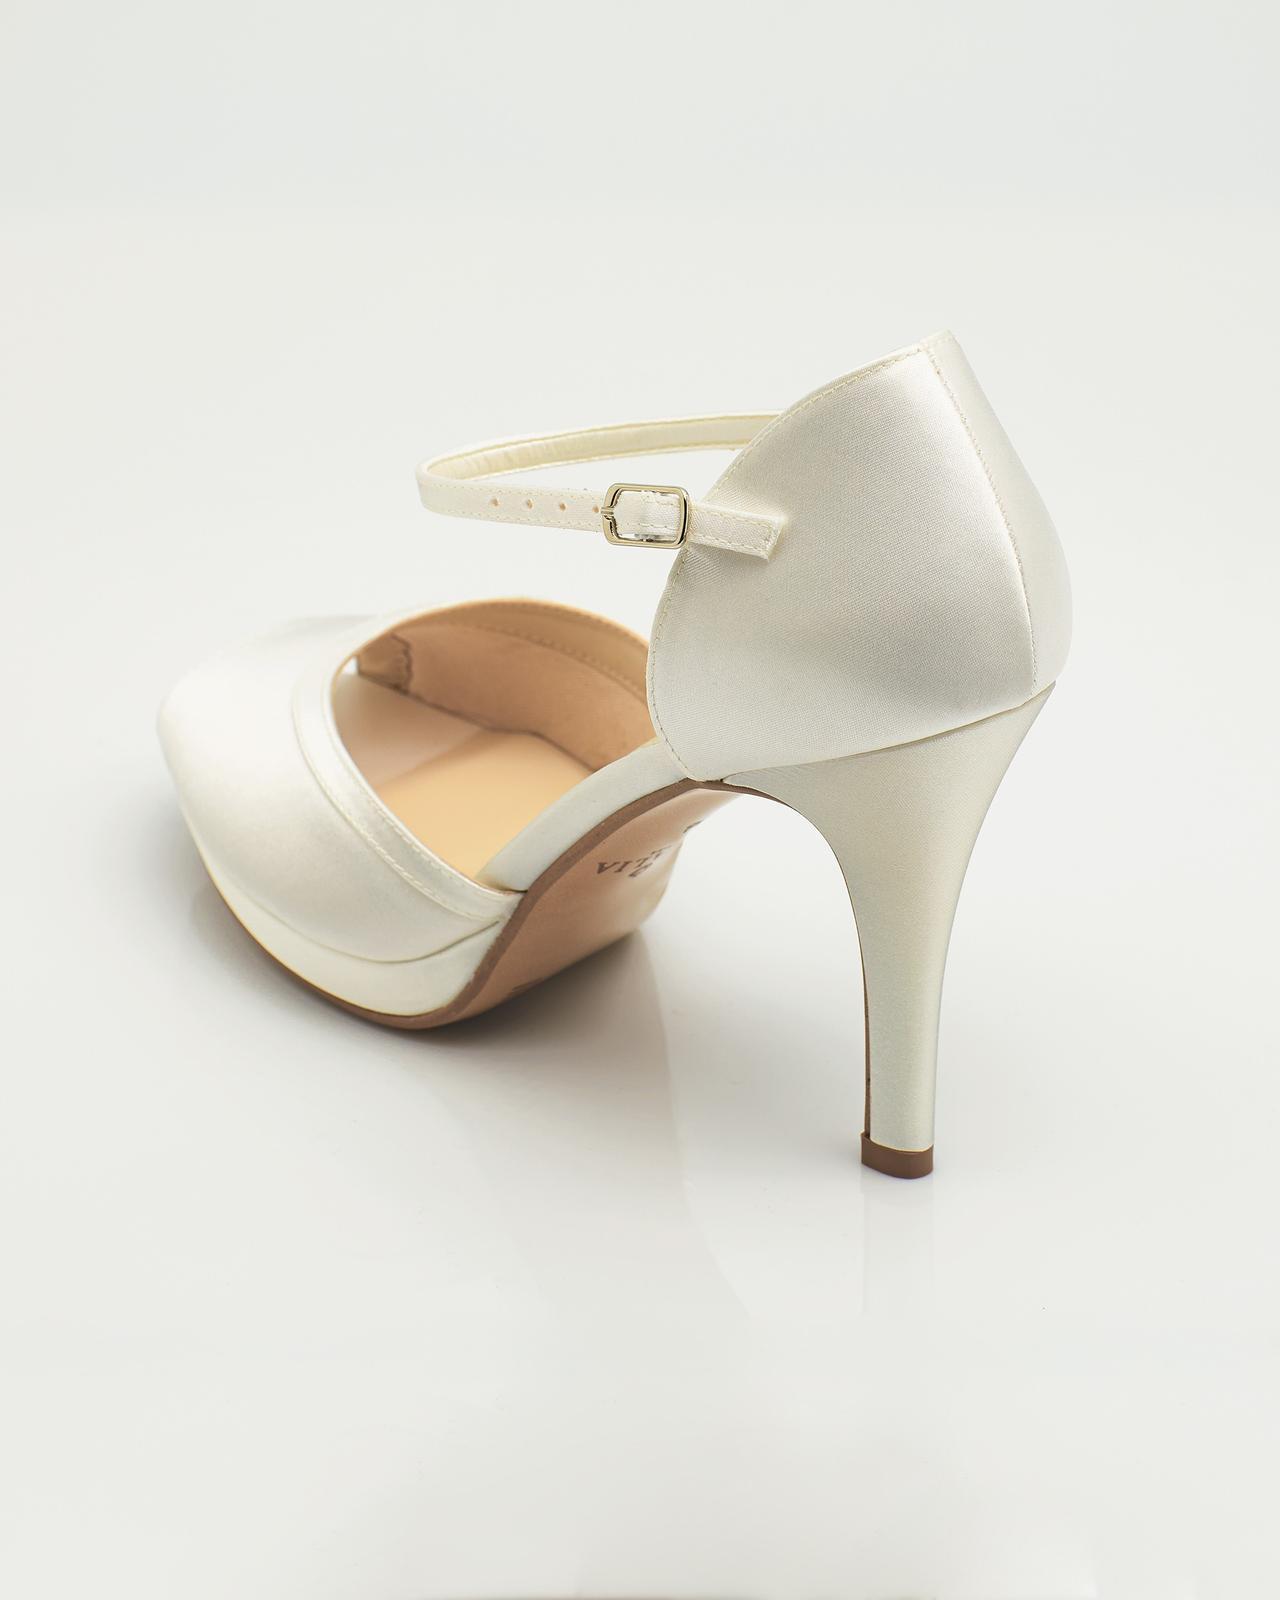 Svadobné topánky Ines - Obrázok č. 2